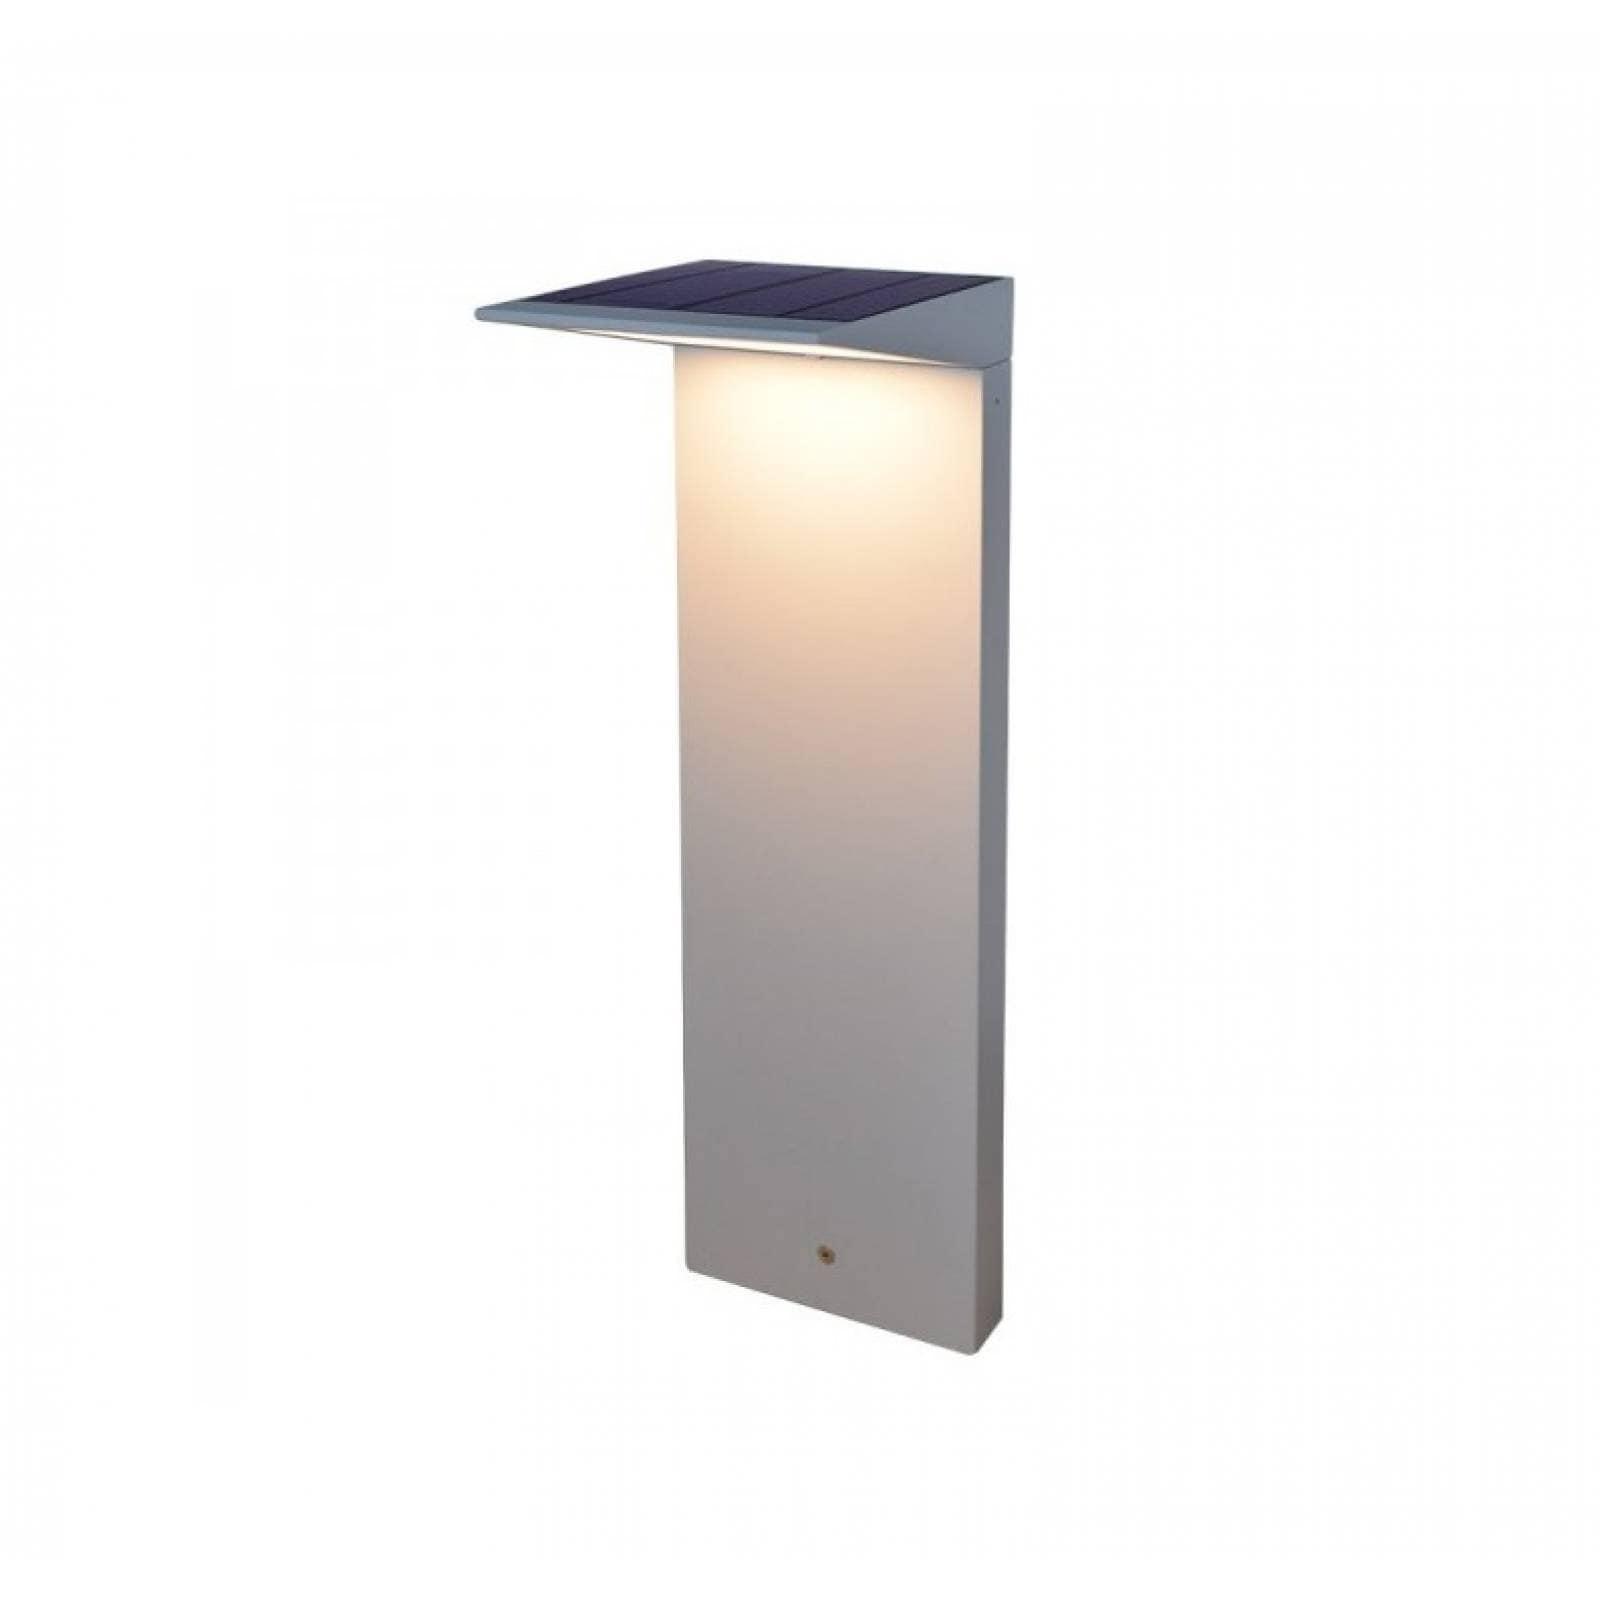 Luminario Mini Poste 14.3 X 48.7 X 17 Cm Exterior 2.2 W